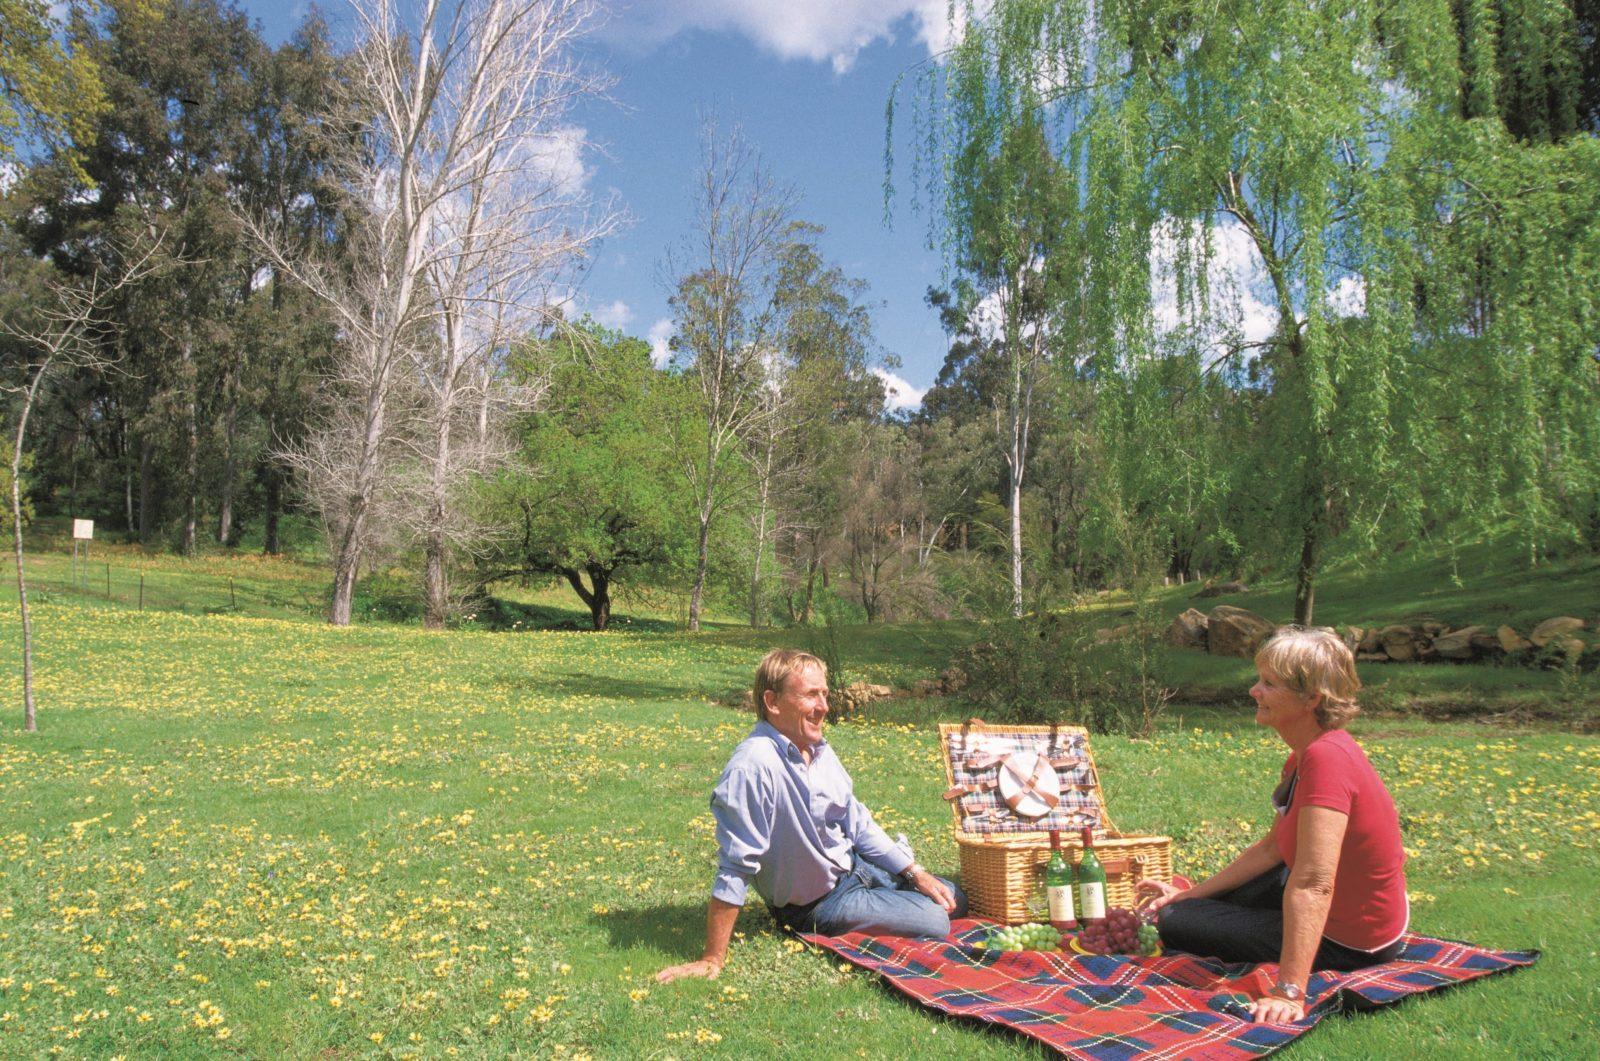 Fred Jacoby Park, Mundaring, Western Australia